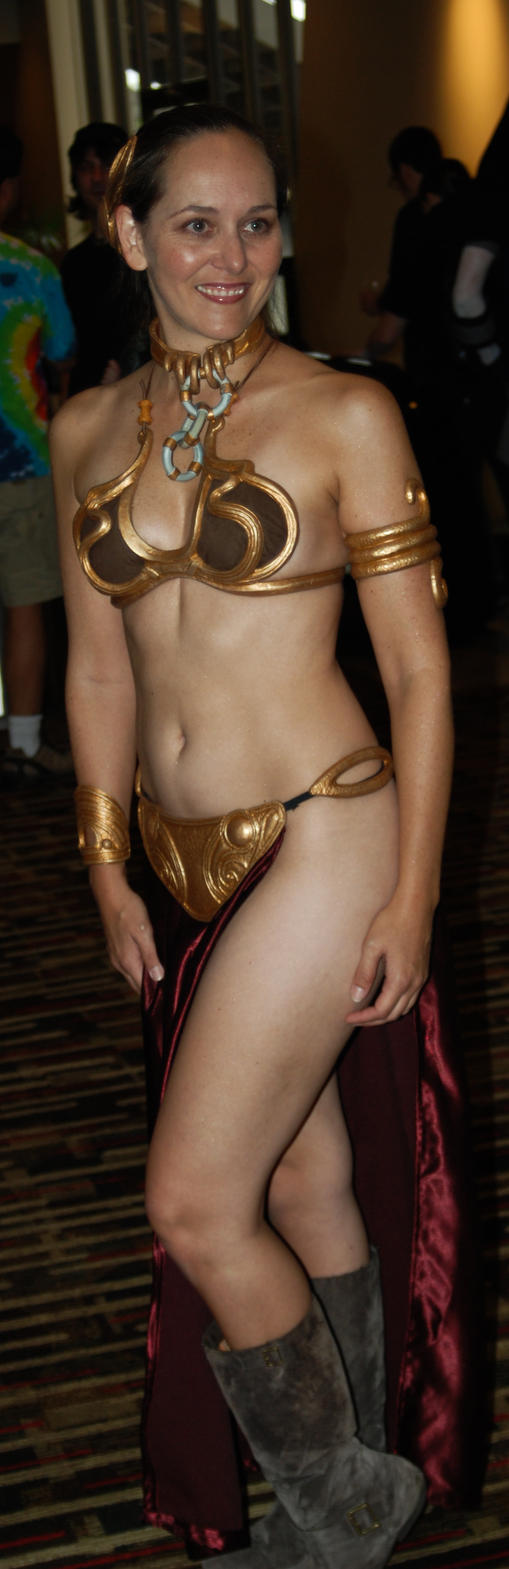 Dragoncon 2009 - Slave Leia by